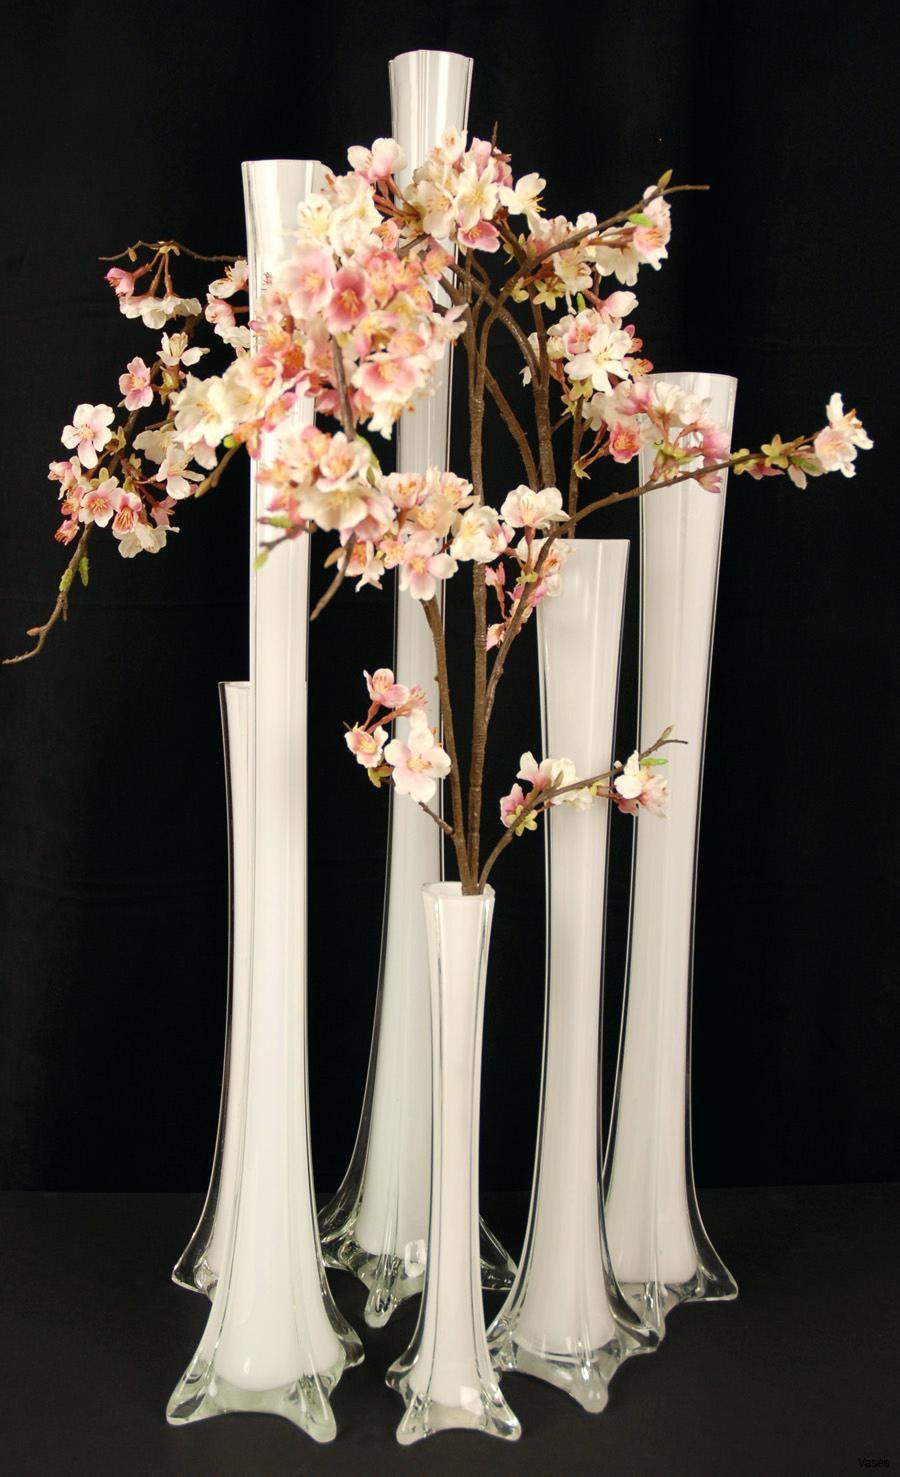 led base lights for vases of eiffel tower vase photos vases plastic tower eiffel vase 31 25in for eiffel tower vase photos vases plastic tower eiffel vase 31 25in frostedi 0d with led light